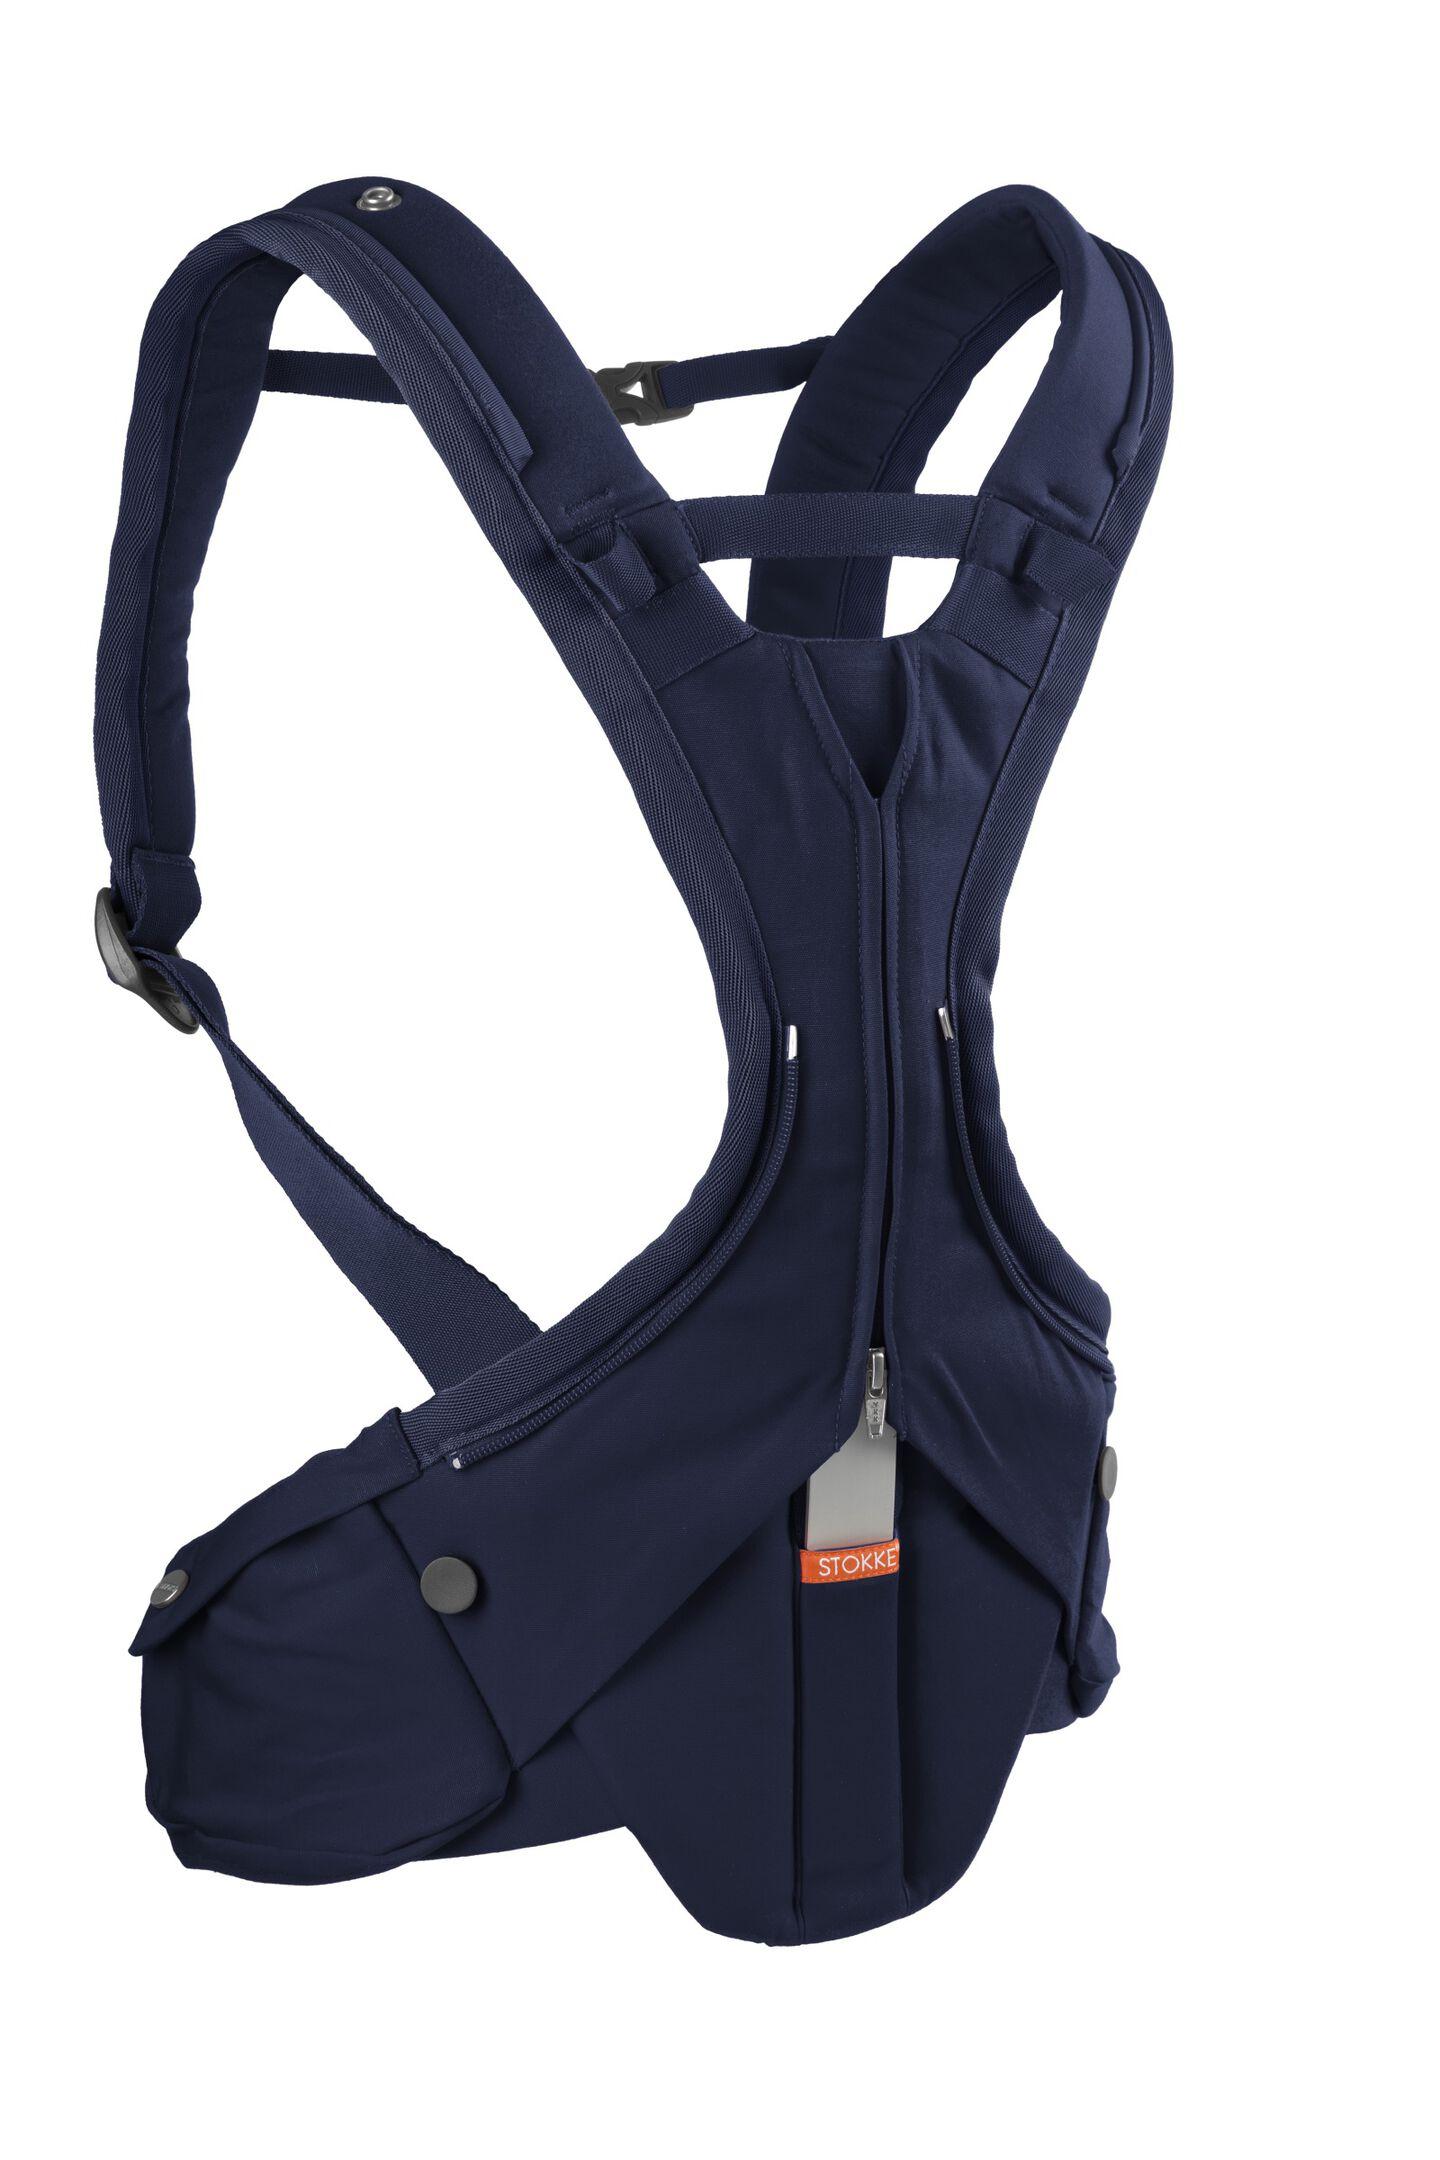 Main Harness, Deep Blue.